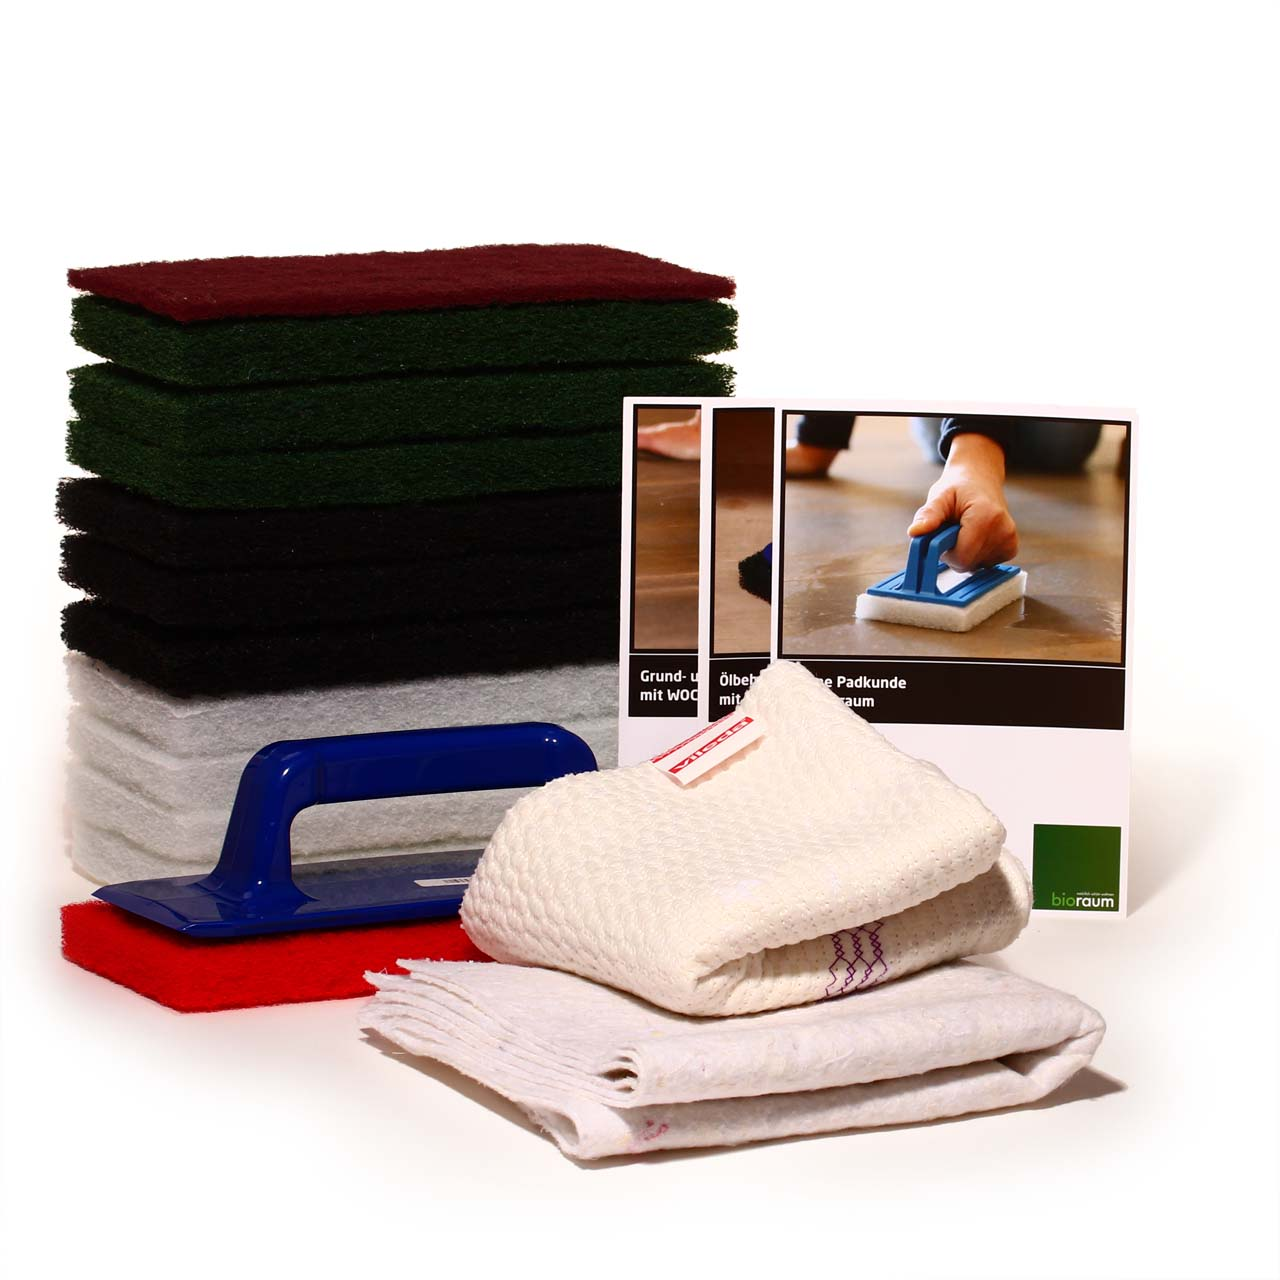 xxl padset gro mit padhalter biofa versand. Black Bedroom Furniture Sets. Home Design Ideas